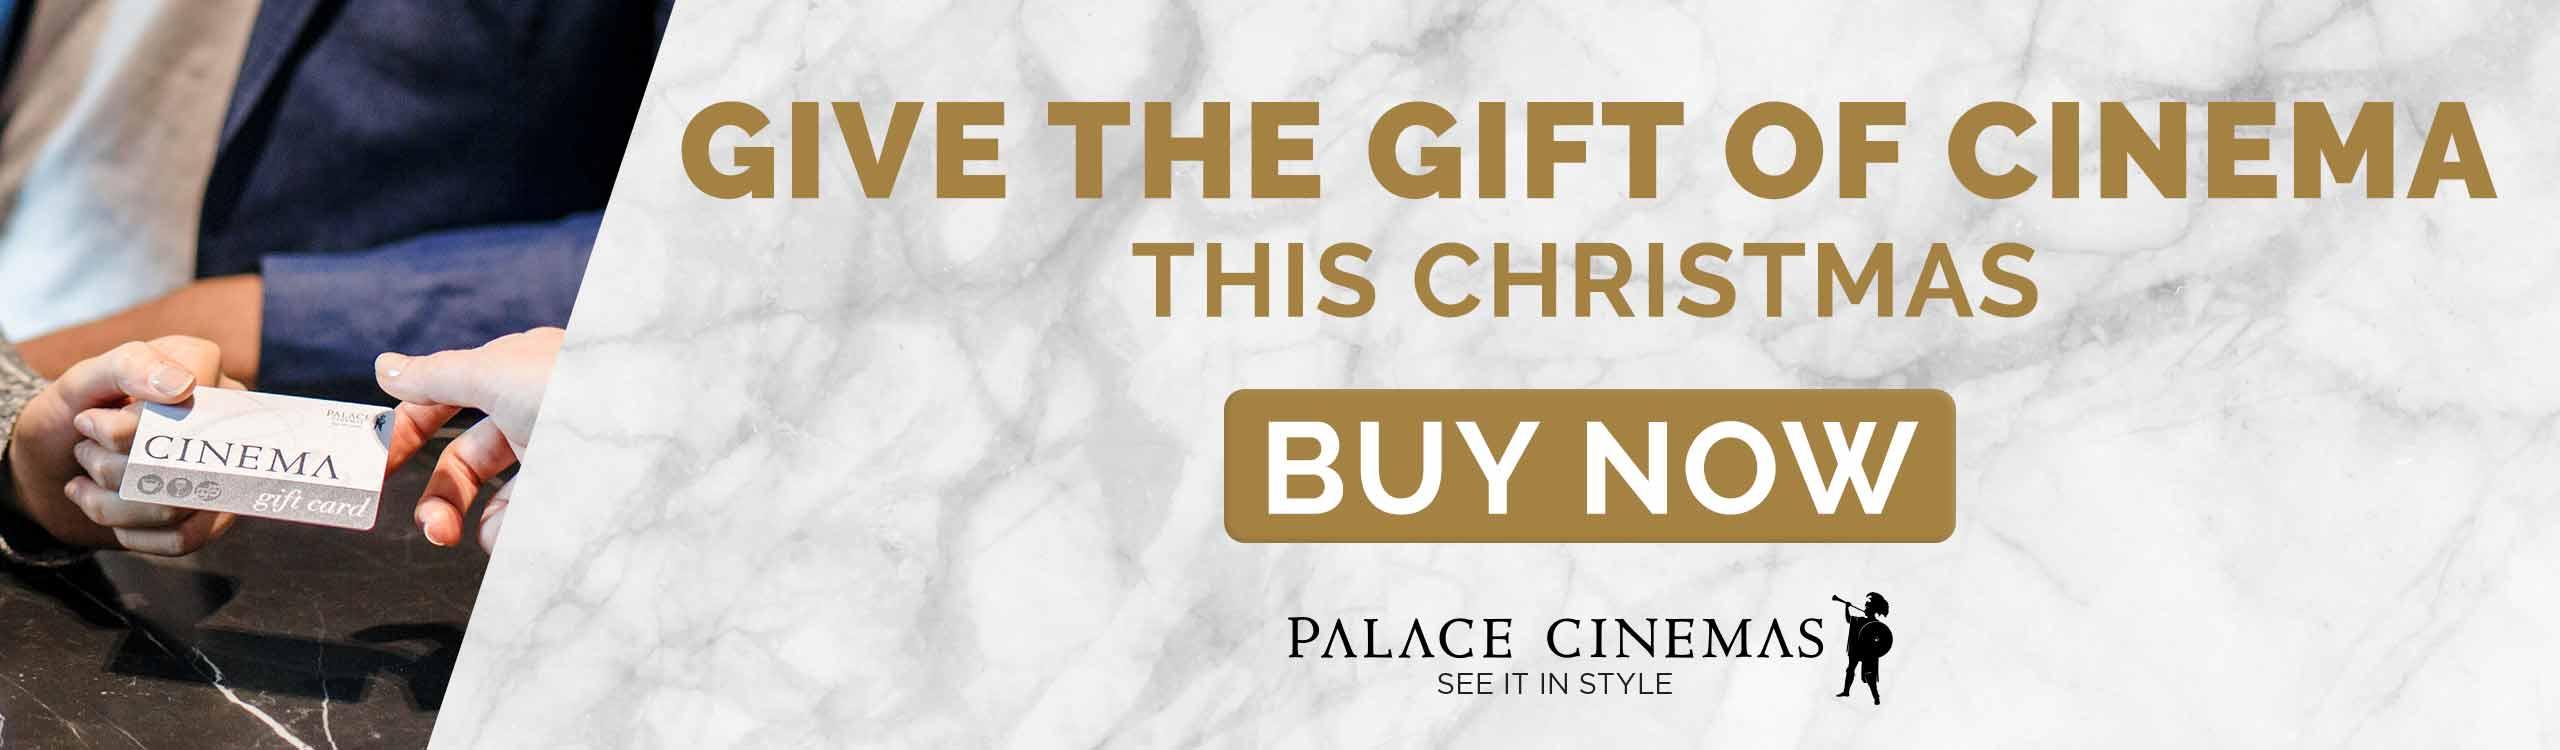 pal009-palace-gift-card-internal-assets-2560x750-nov7-v2.jpg